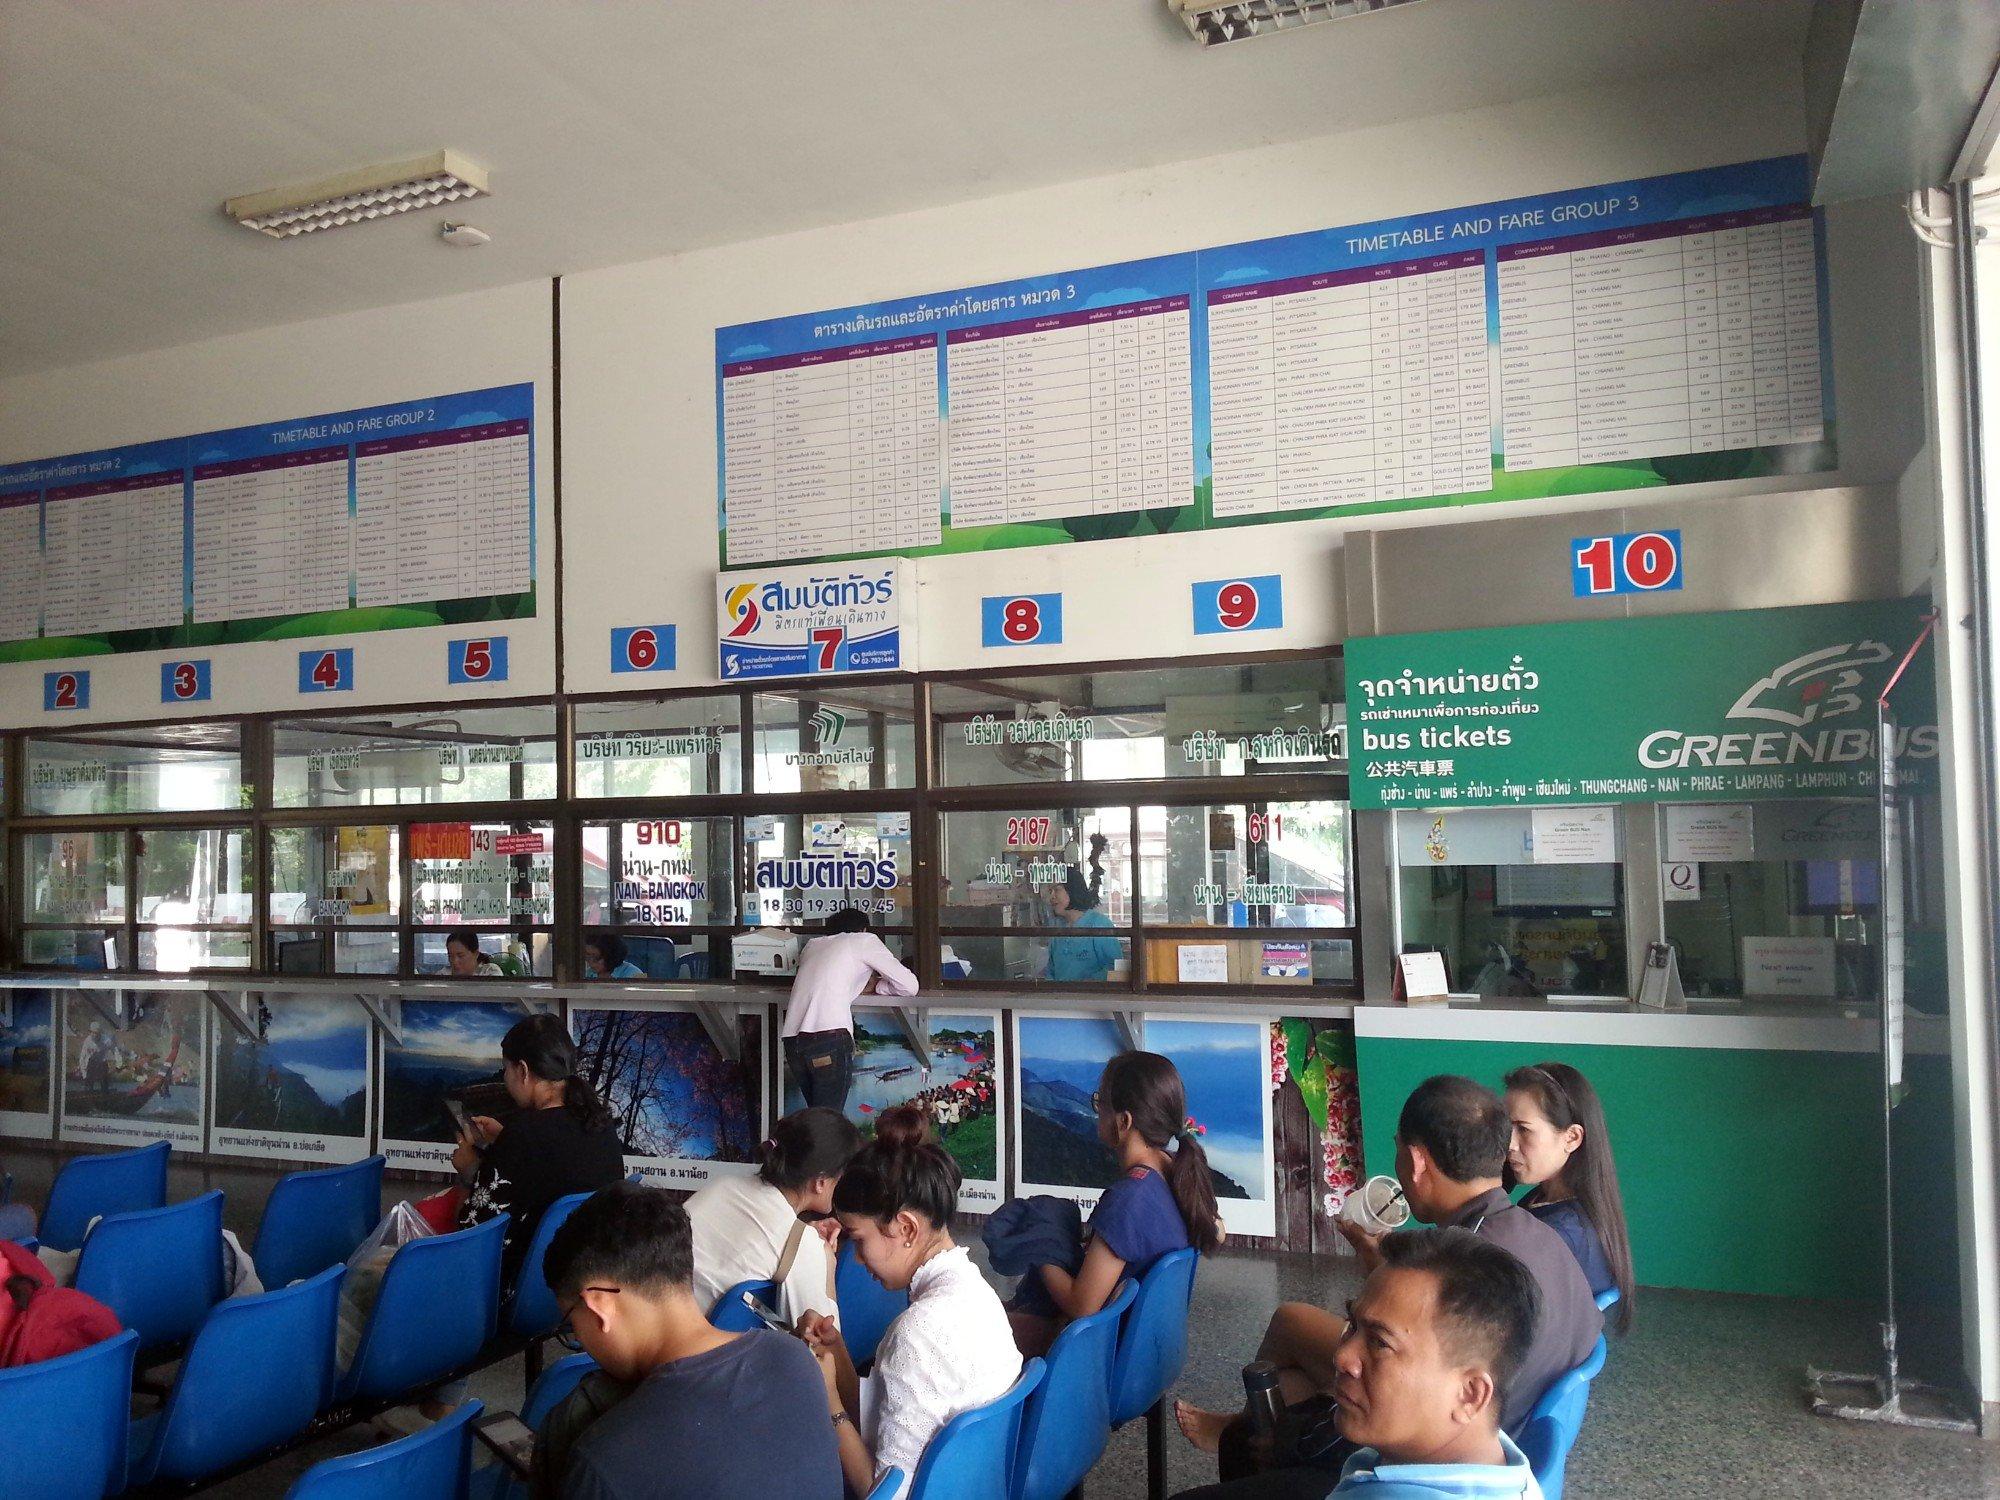 Ticket offices at Nan Bus Terminal